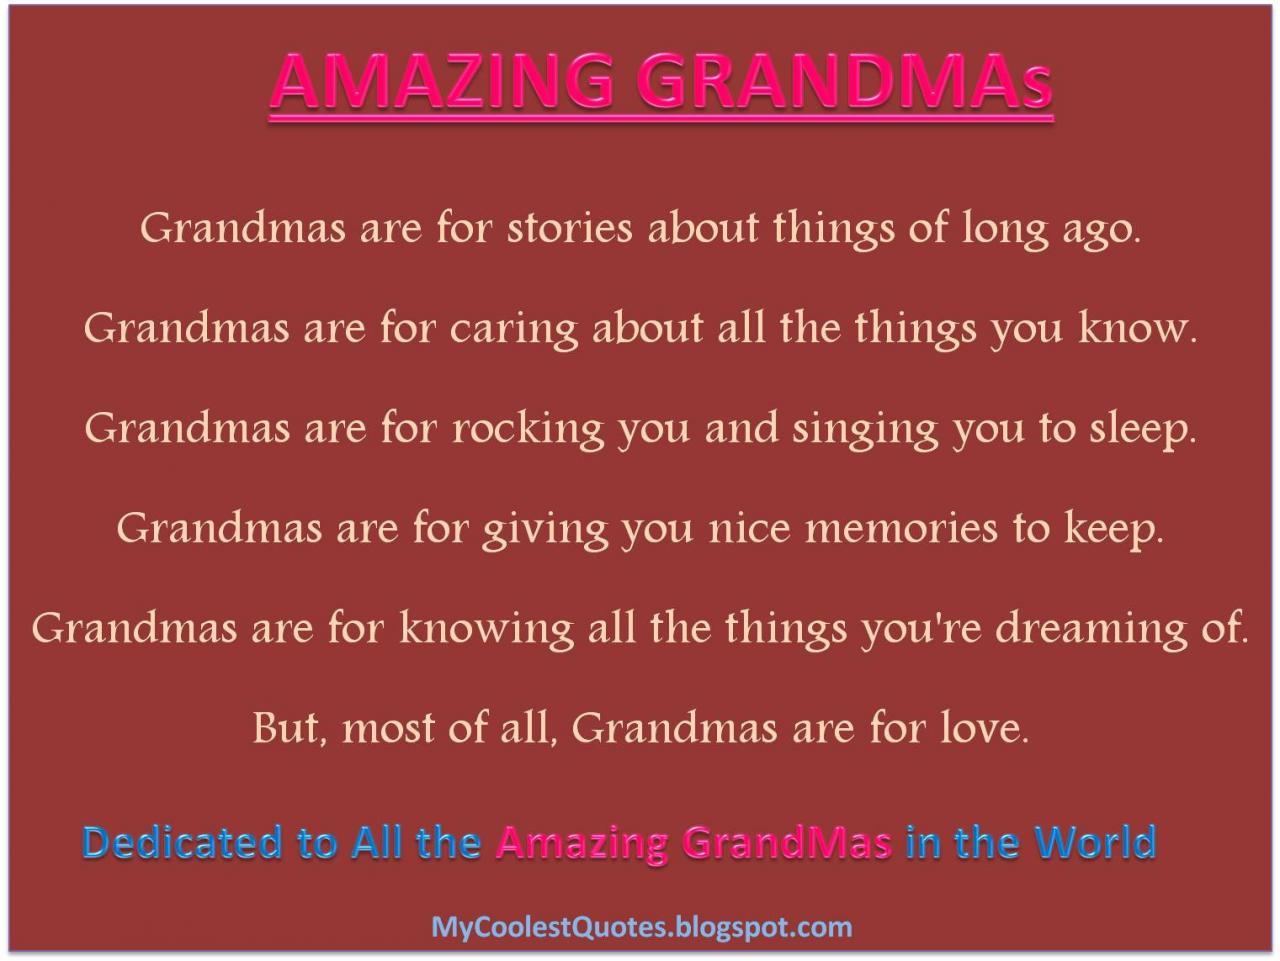 Amazing Grandmas